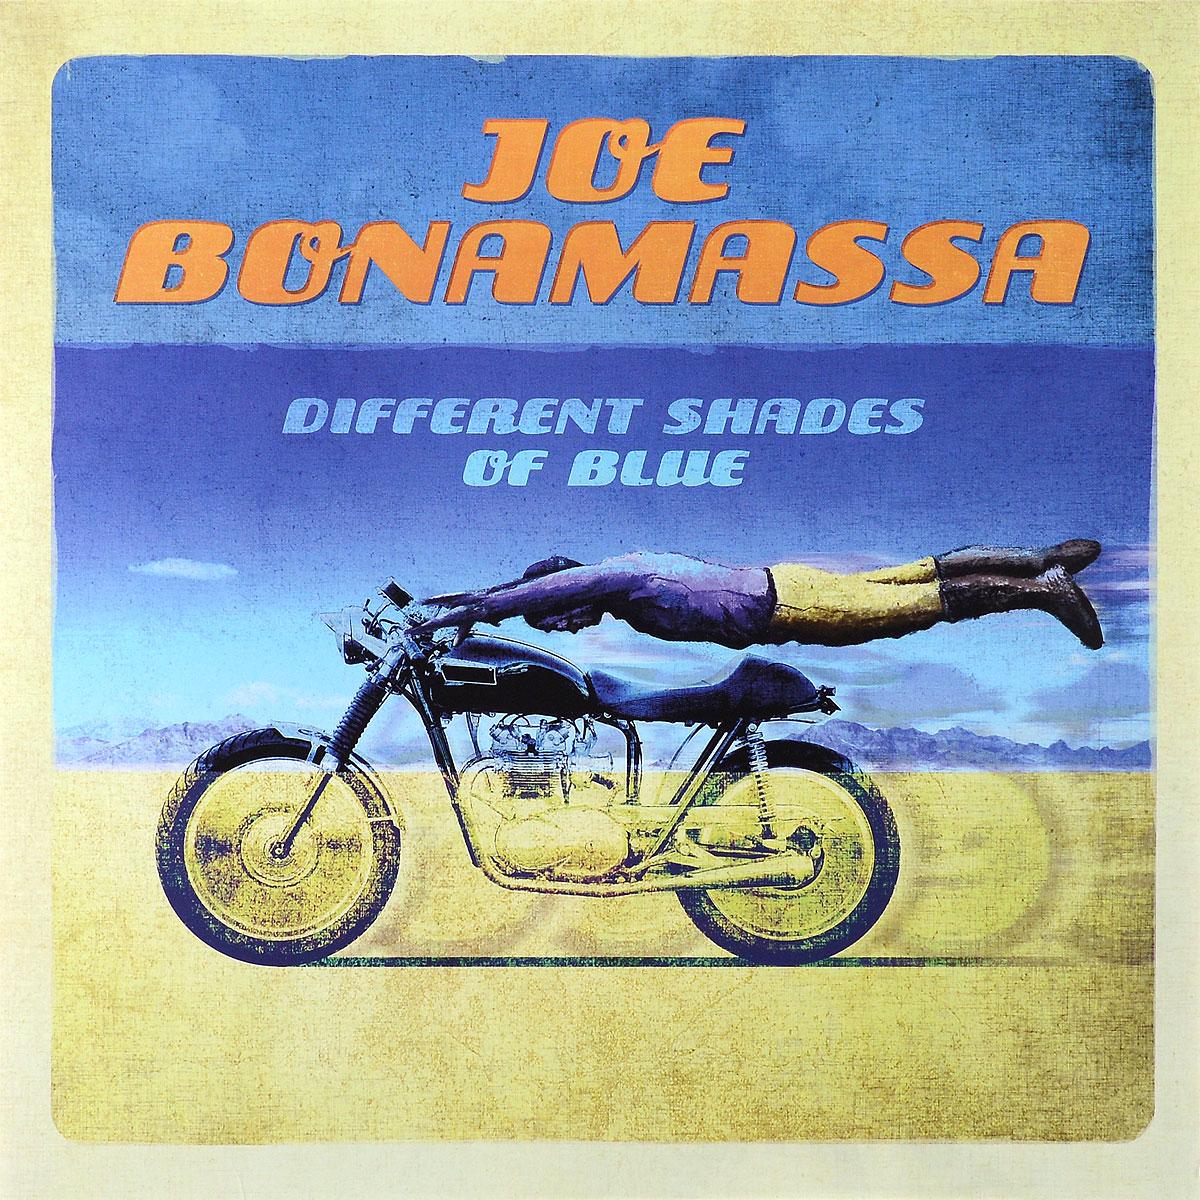 Джо Бонамасса Joe Bonamassa. Different Shades Of Blue (LP) tolkien j r r the silmarillion